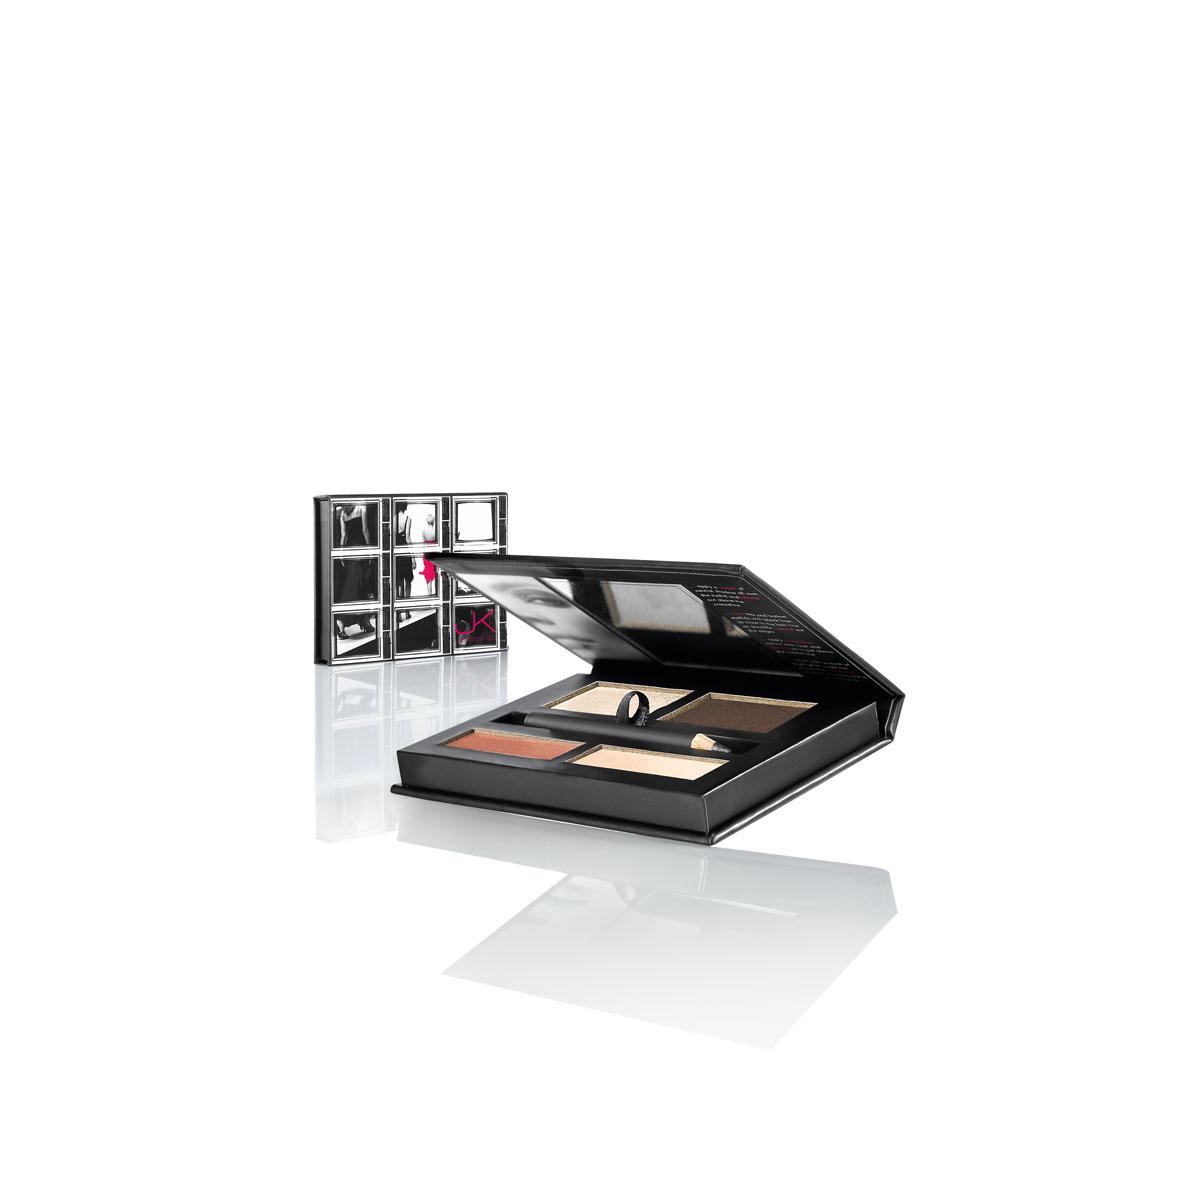 JK Jemma Kidd Fashion Palette ($36) — smokey shadow palette, black sparkly pencil, and nude gloss.